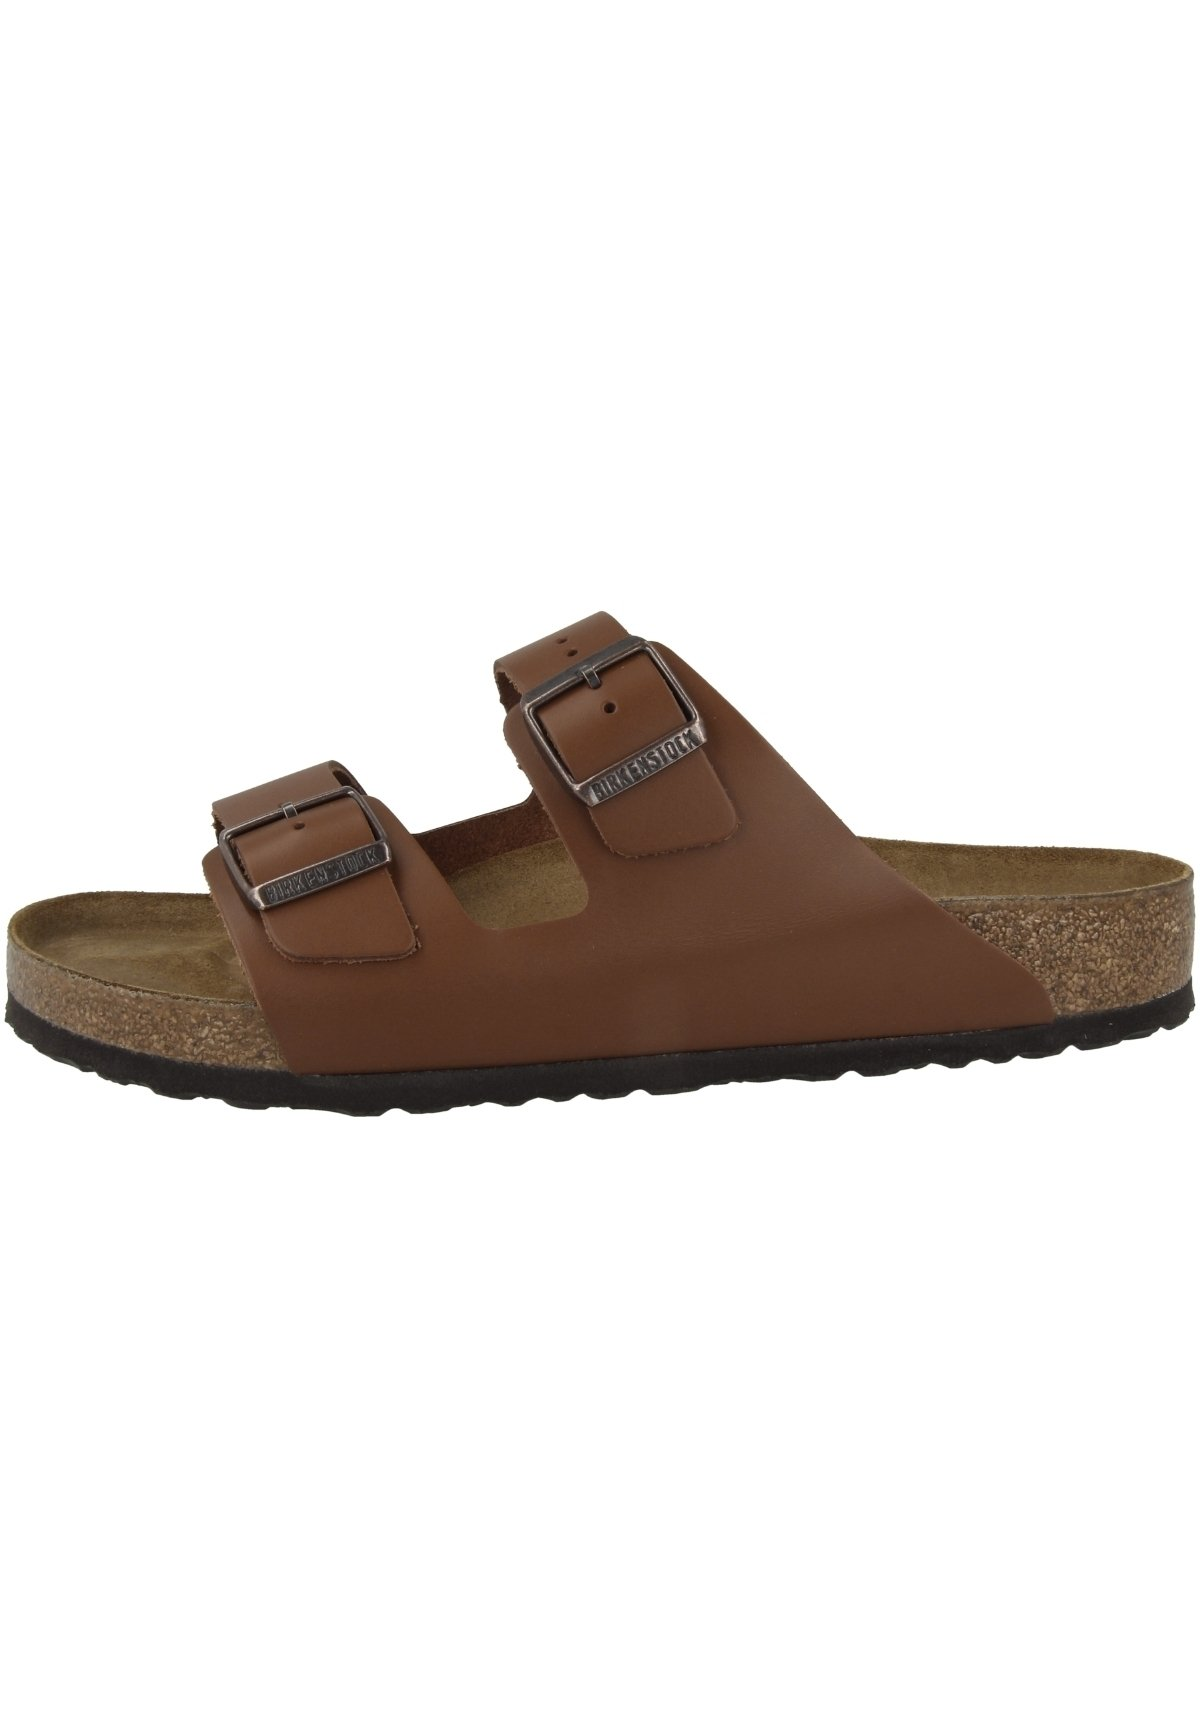 Herren ARIZONA - Pantolette flach - ginger brown